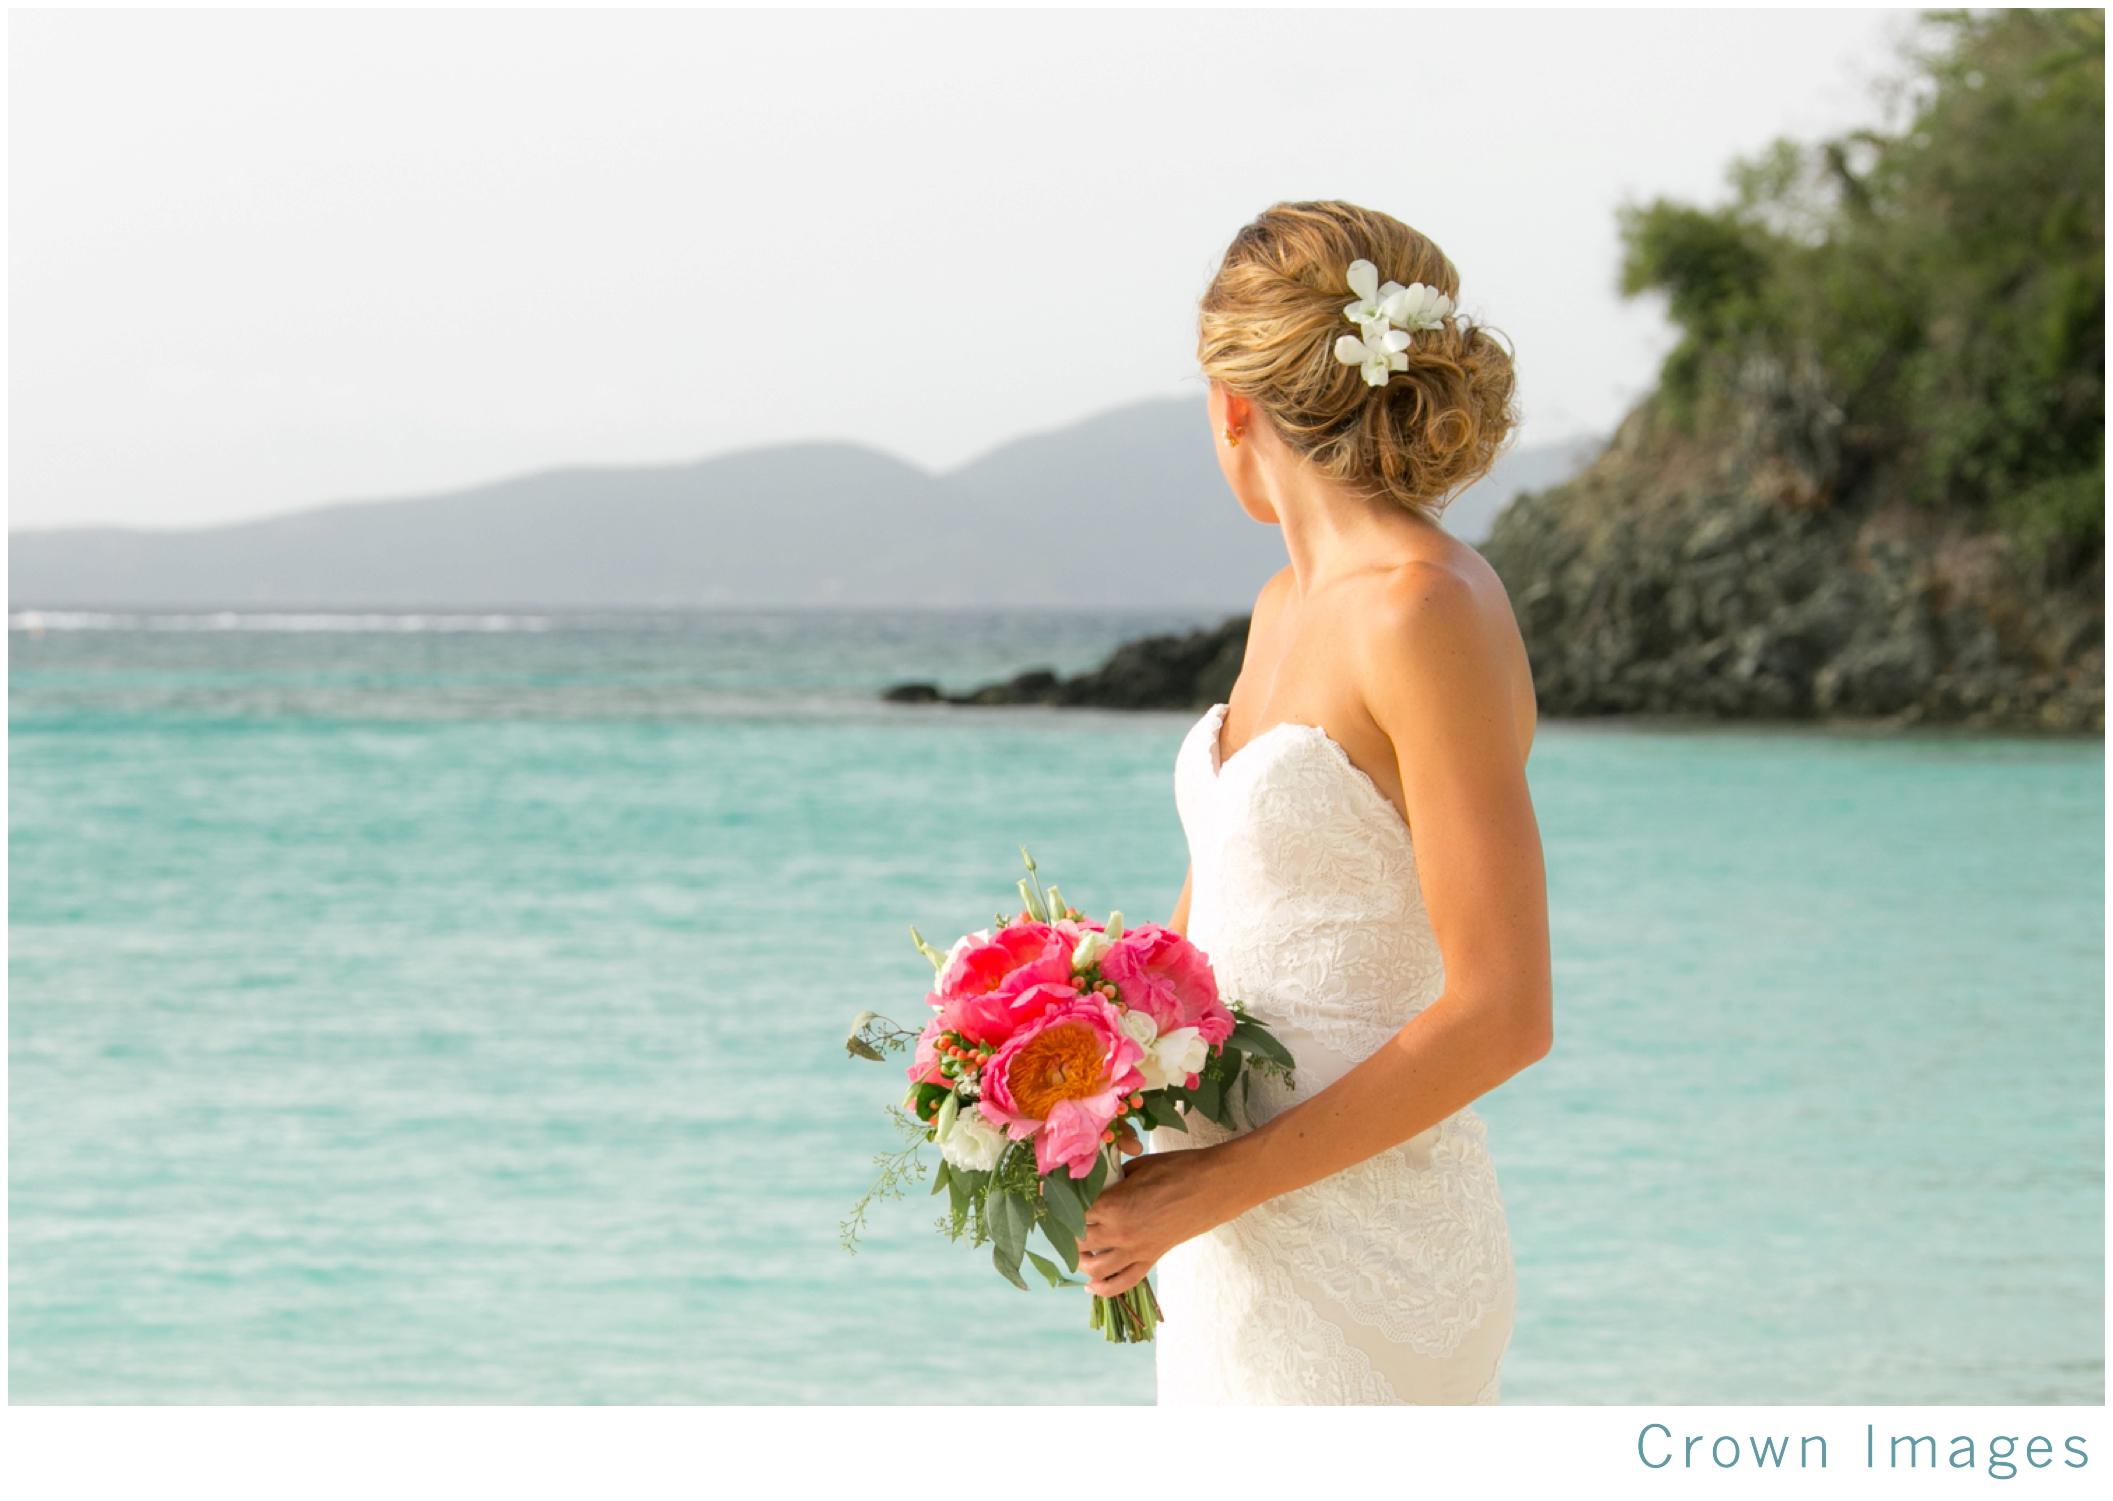 wedding photos crown images_1672.jpg